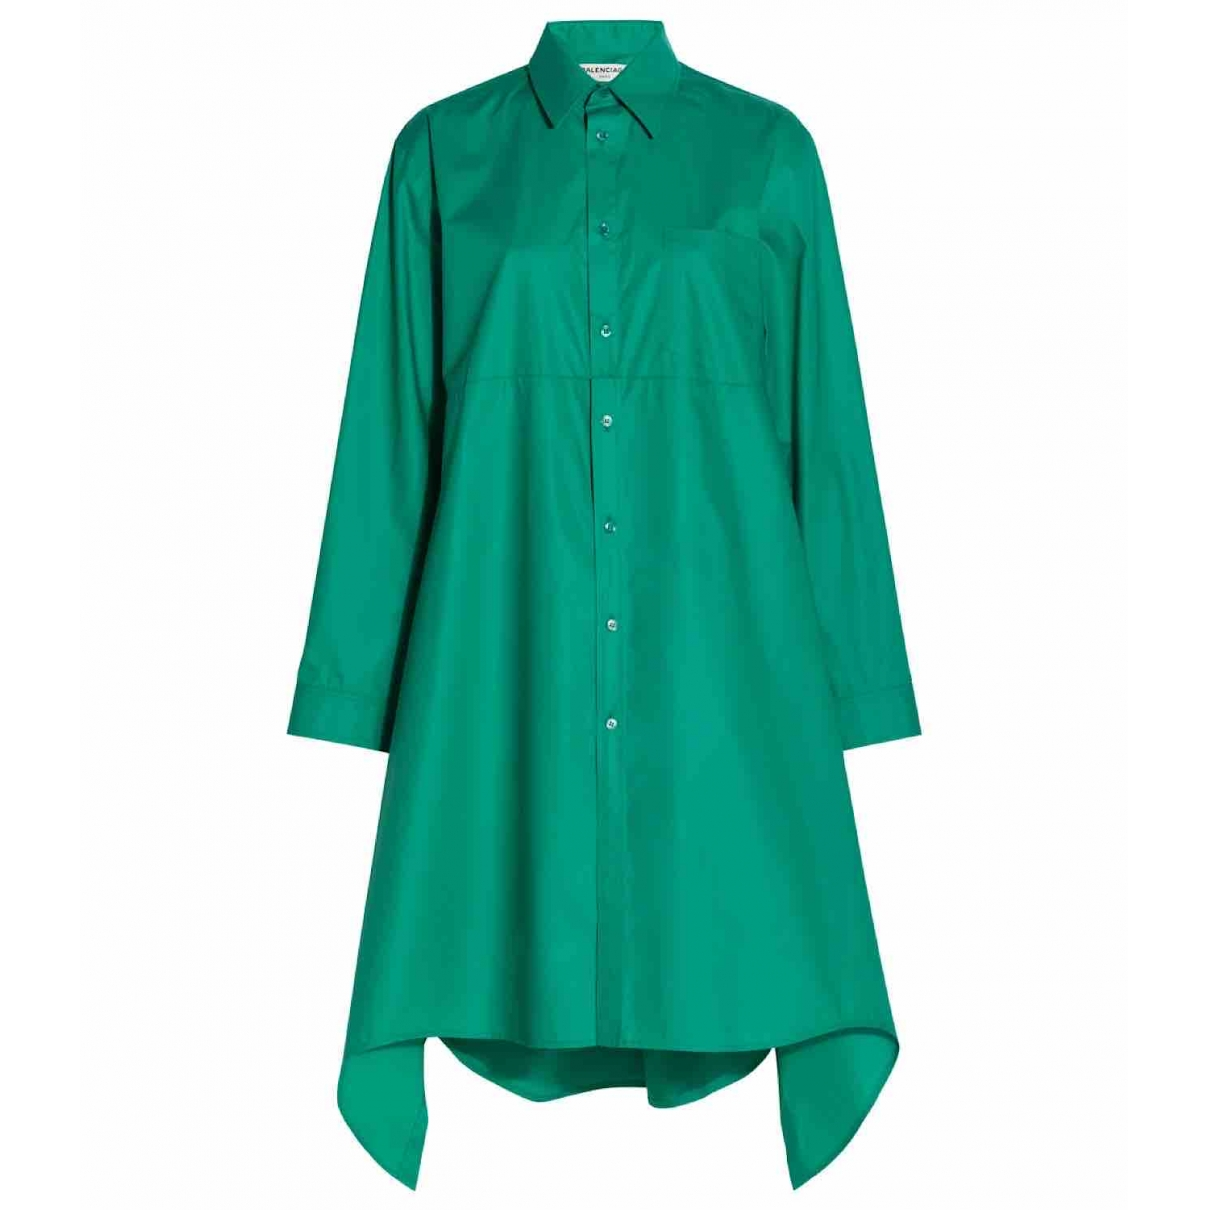 Balenciaga \N Green Cotton dress for Women 36 FR